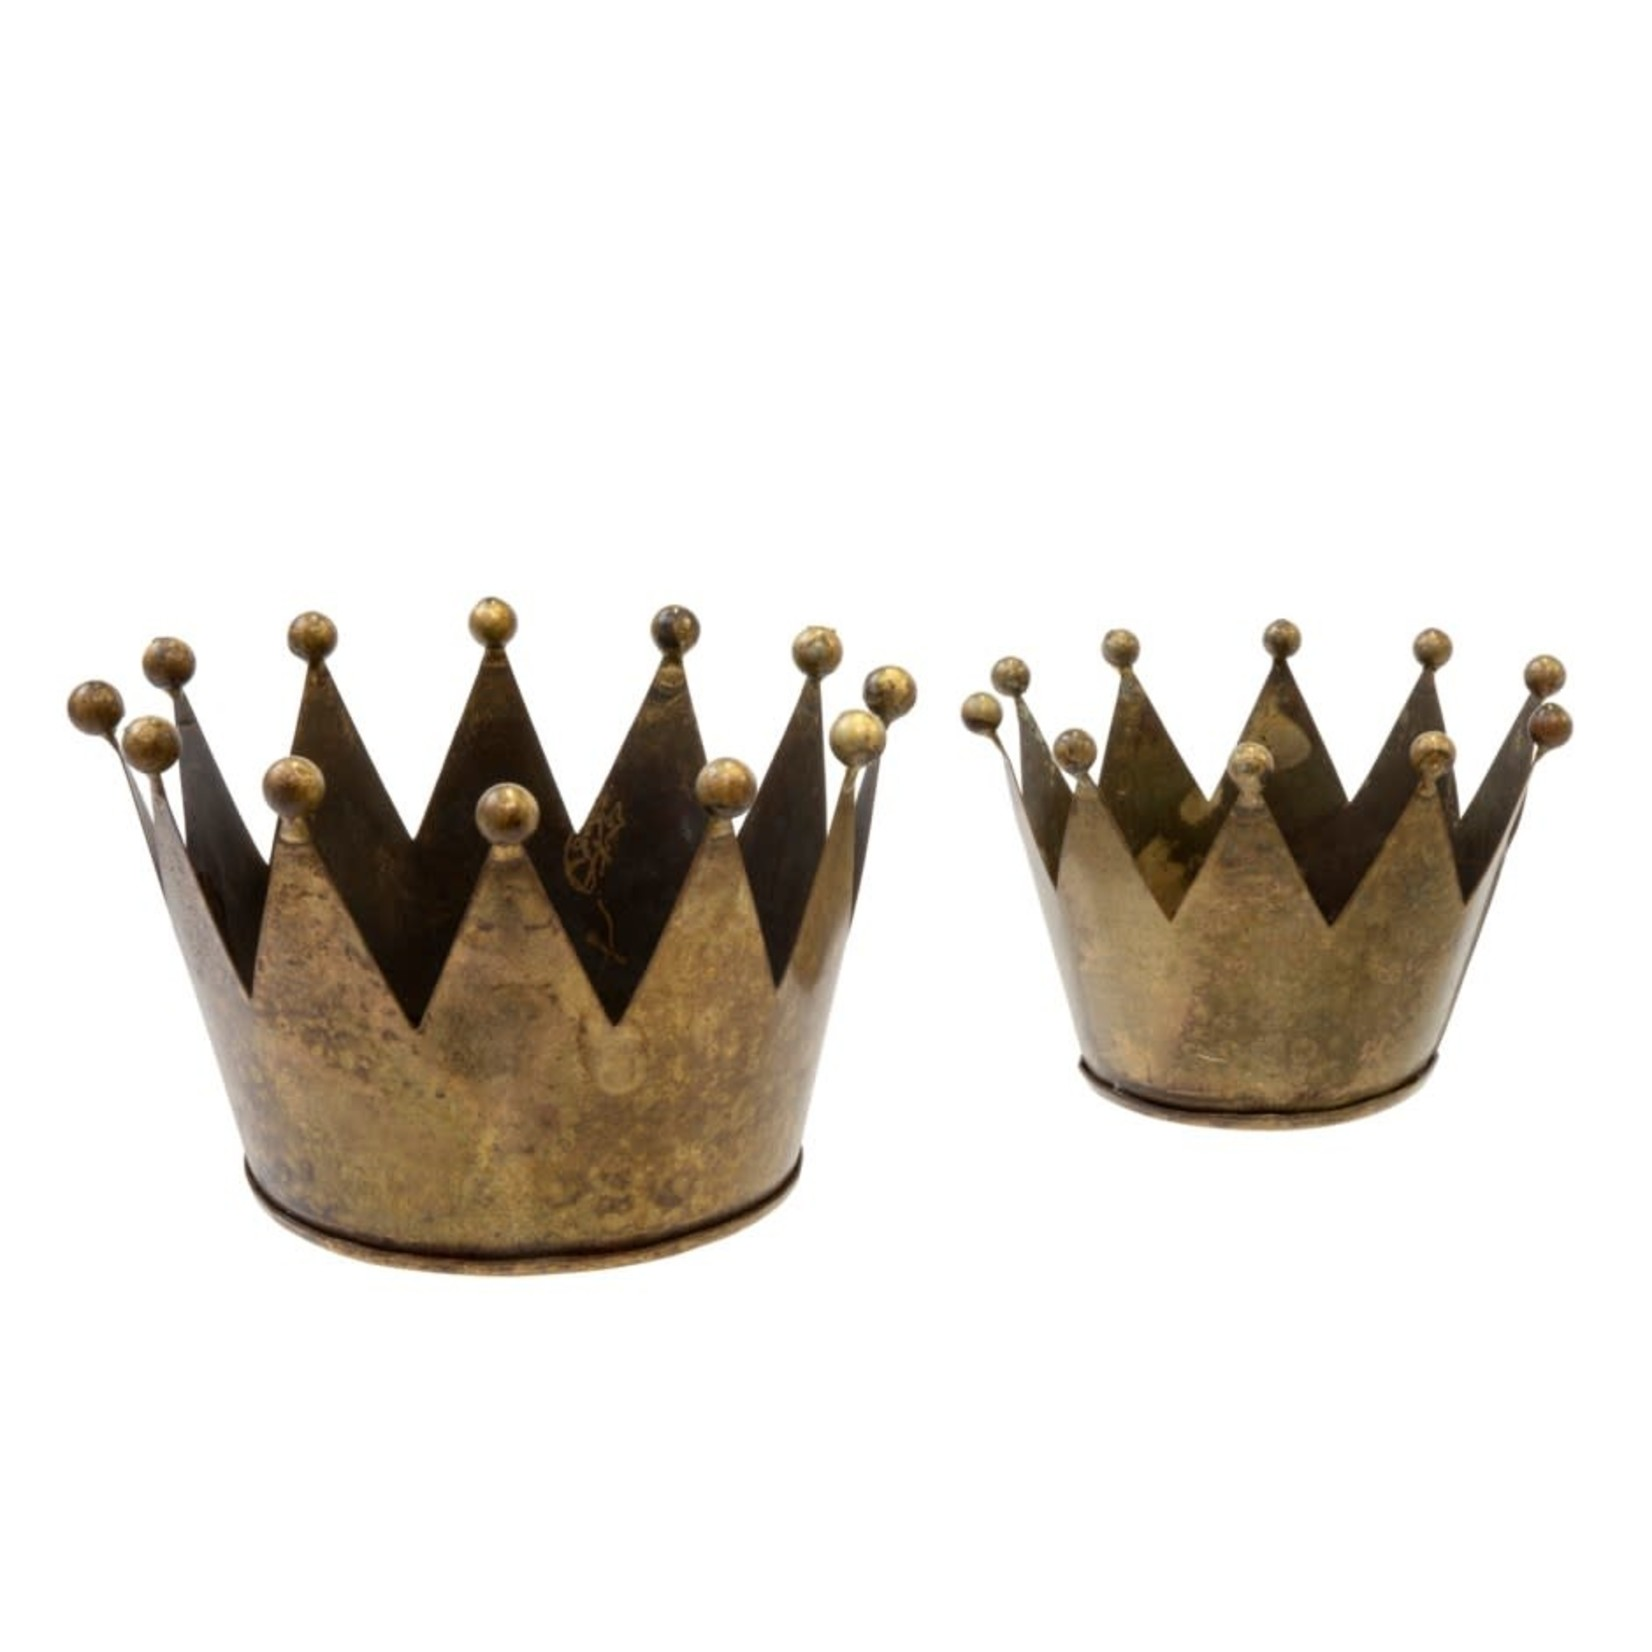 King's Crown Votives